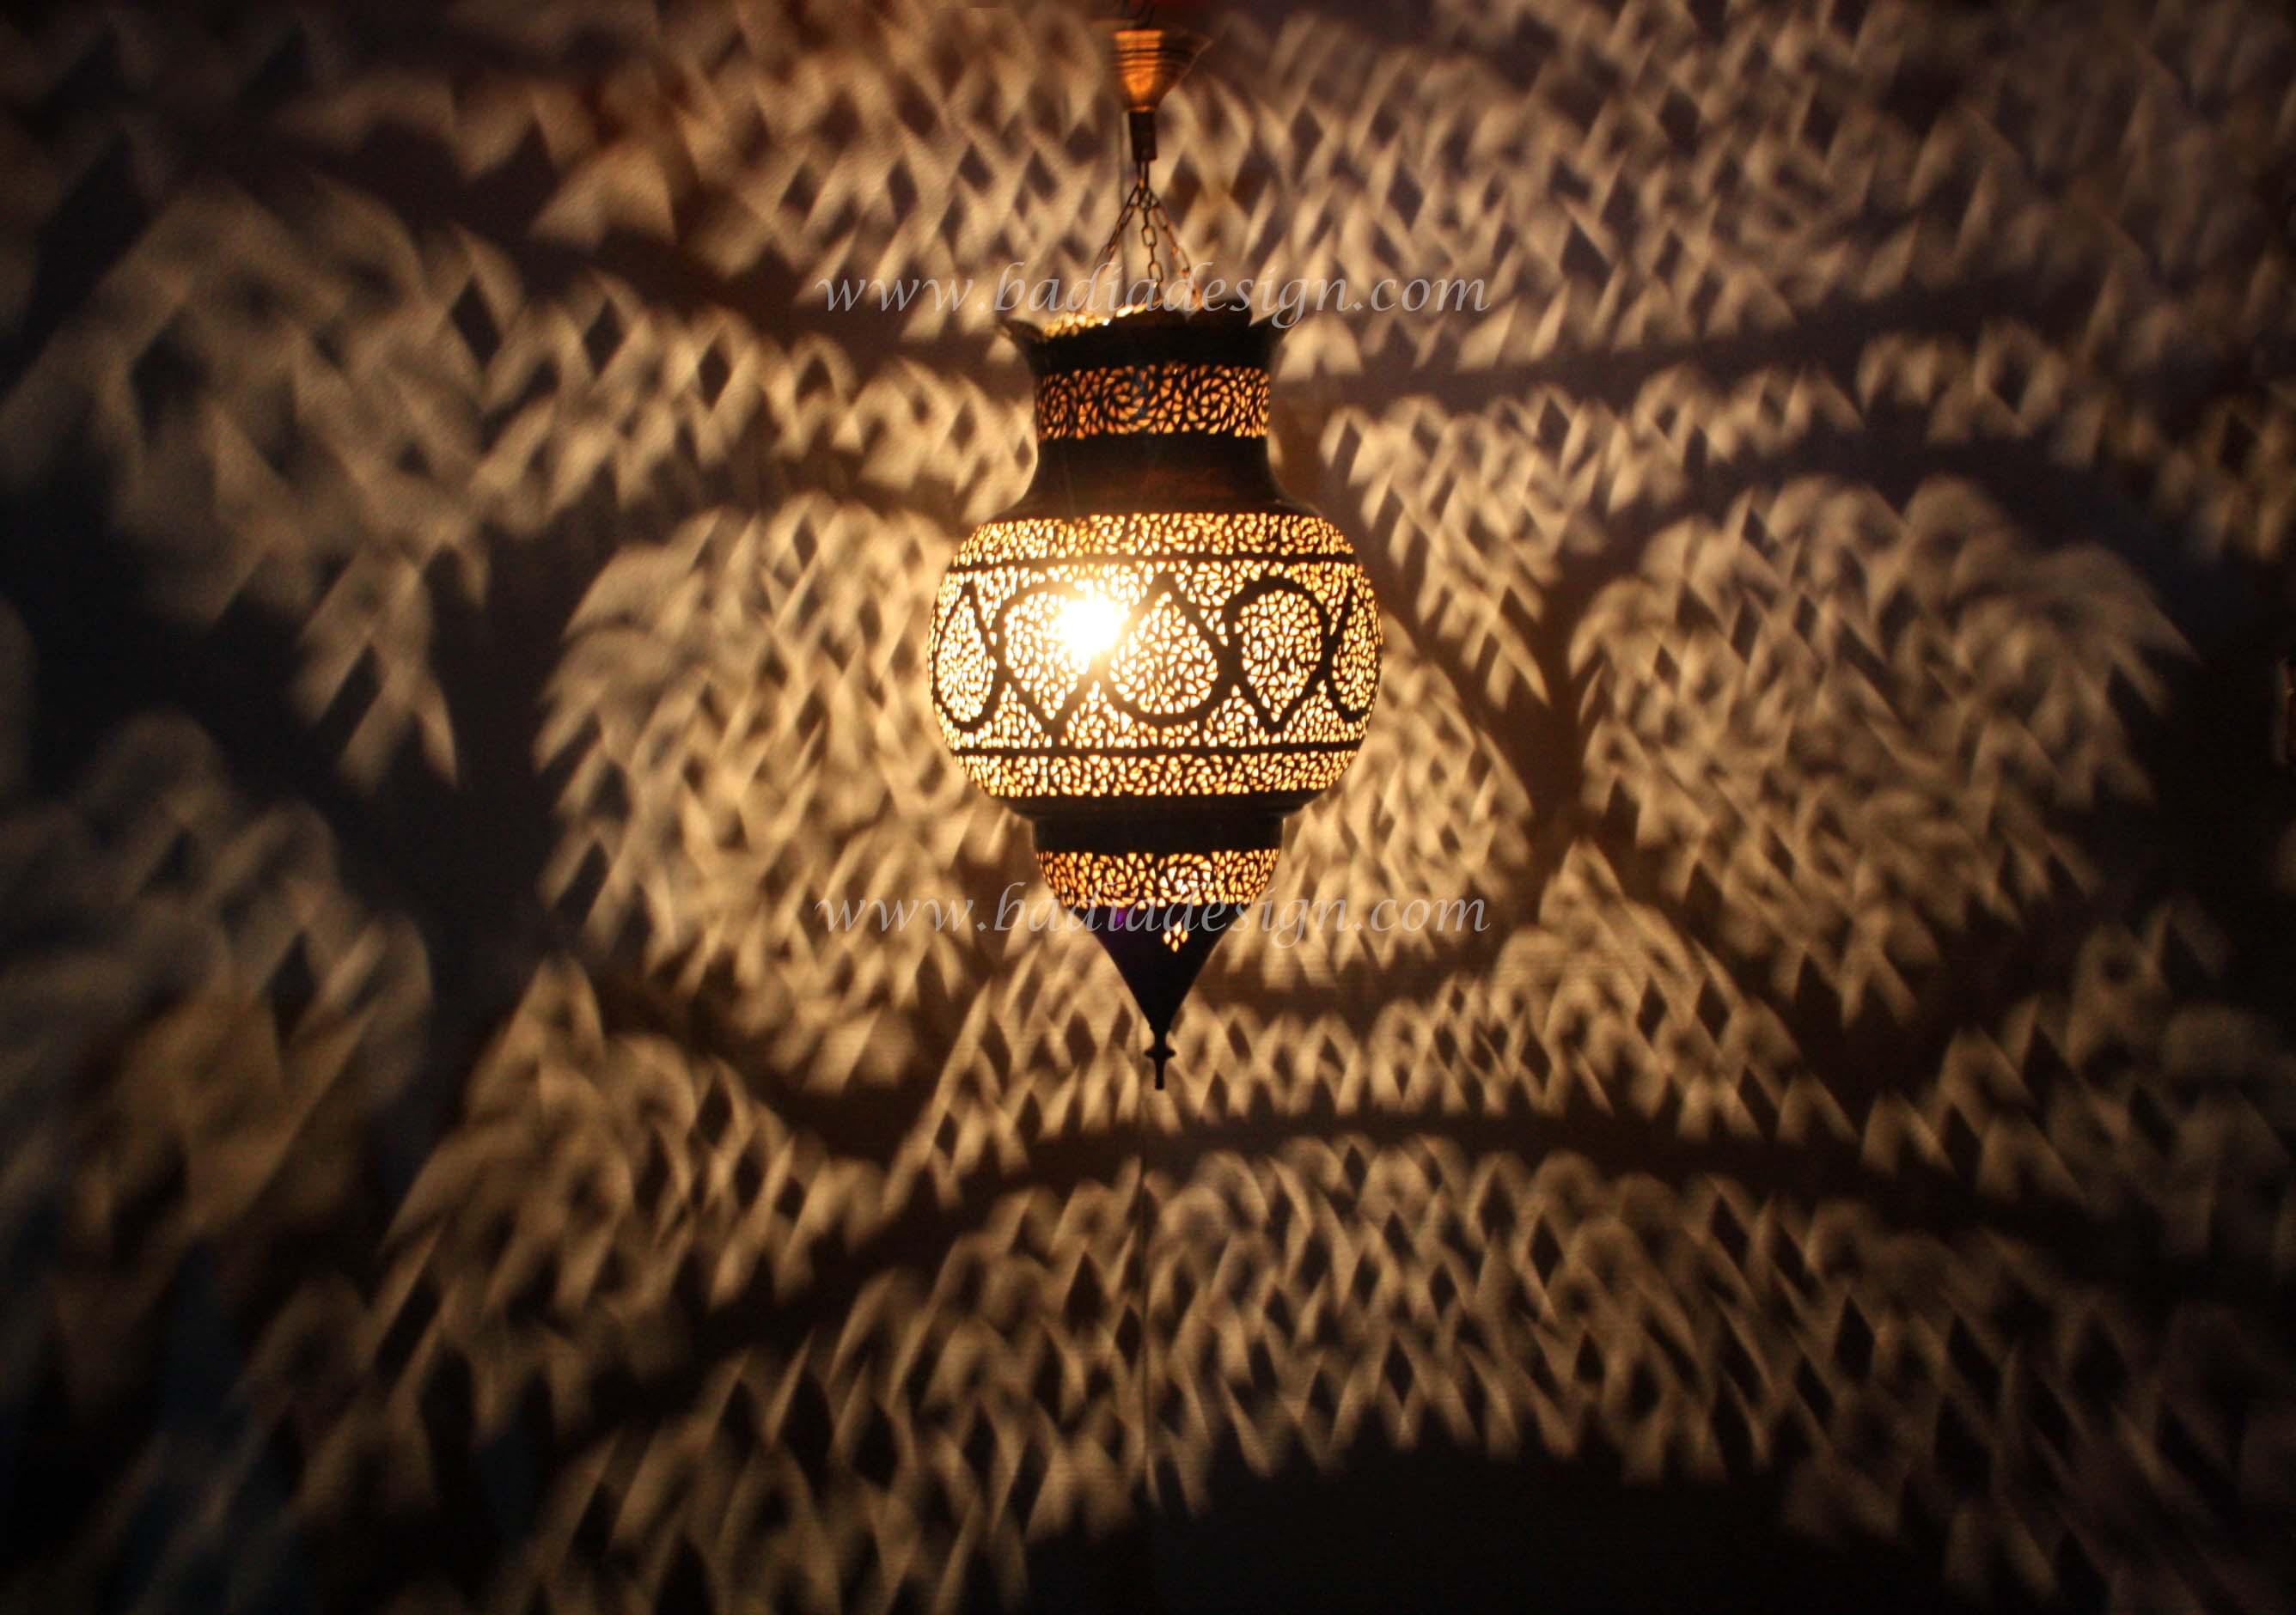 moroccan-hand-punched-brass-lantern-lig189-1.jpg